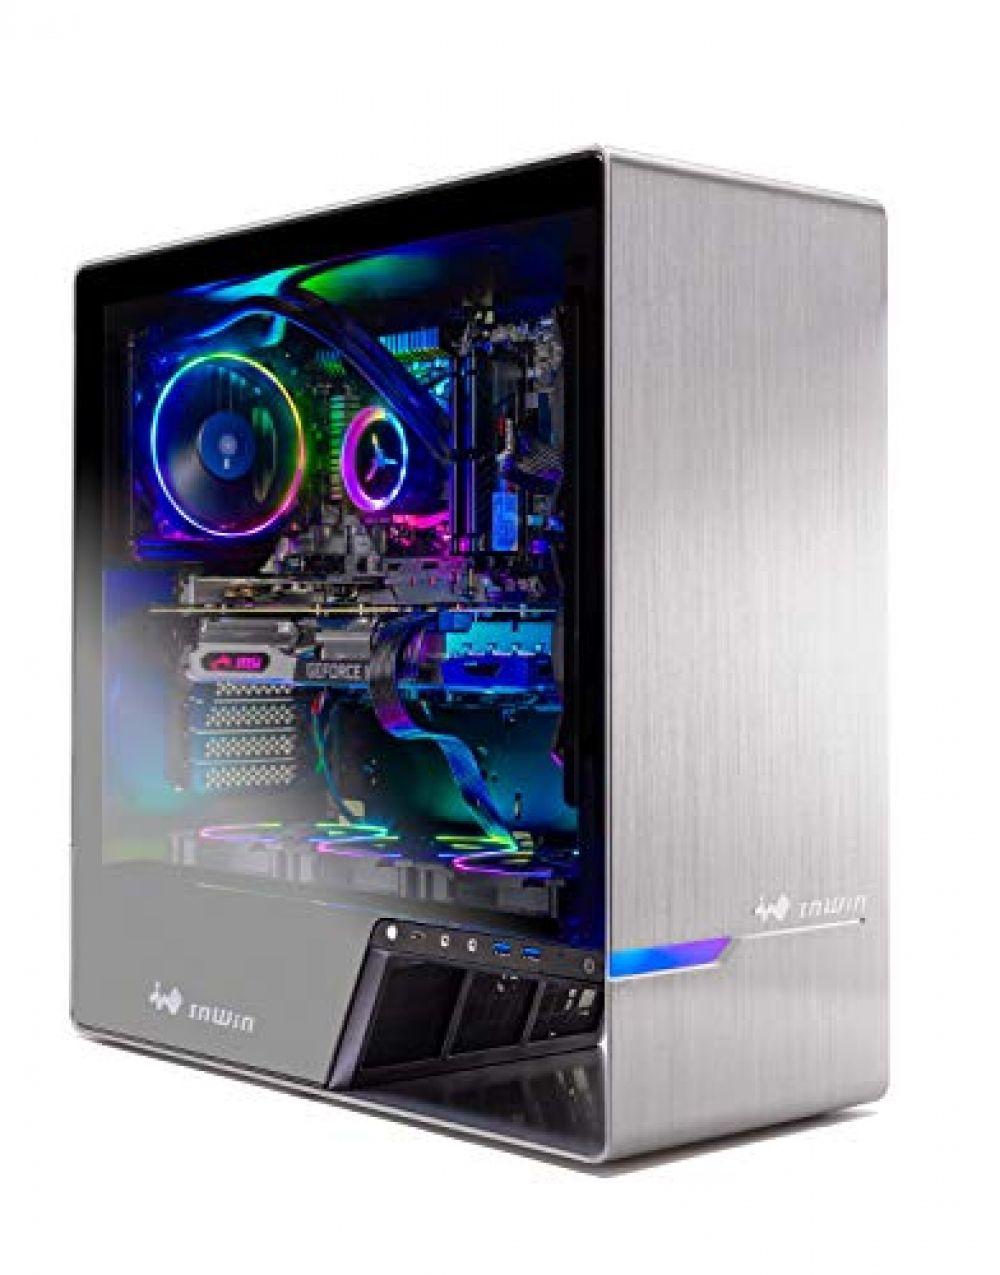 Skytech Legacy Gaming Computer Pc Desktop Ryzen 7 3700x 3 6ghz Rtx 2070 Super 8g 500gb Ssd 16gb Ddr4 3000mhz Rgb Fans Windows 10 Home 64 Bit 120mm Aio C In 2020